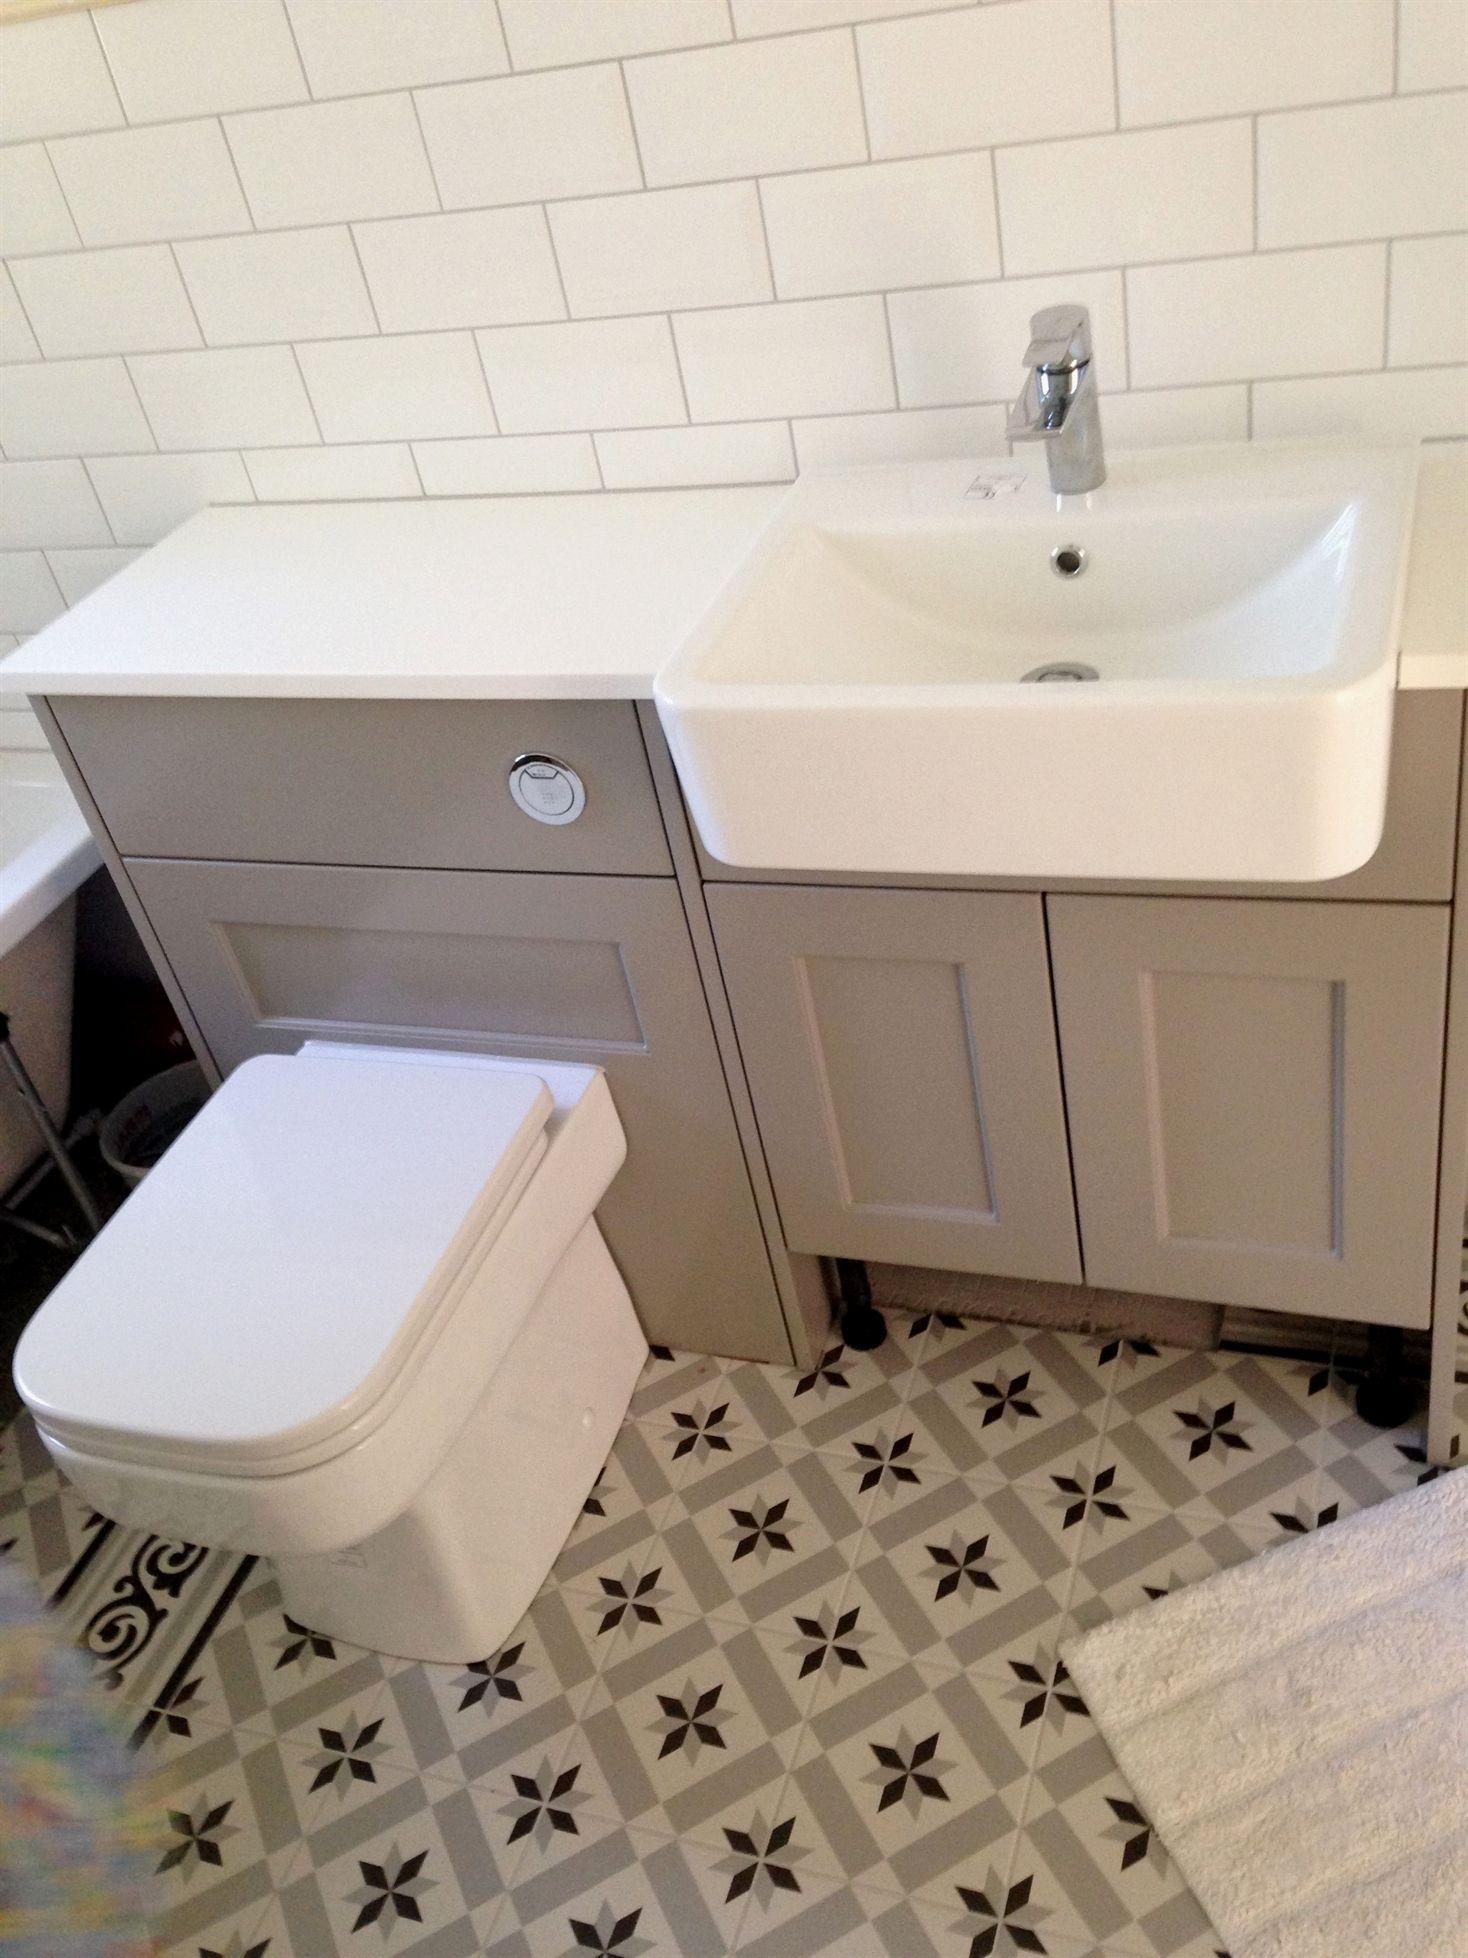 Roper Rhodes Burford Mocha Geo Bathroom Suite Fired Earth Patisserie Sucre Floor Tiles White Metro Til Bathroom Suite Homebase Bathrooms Downstairs Bathroom